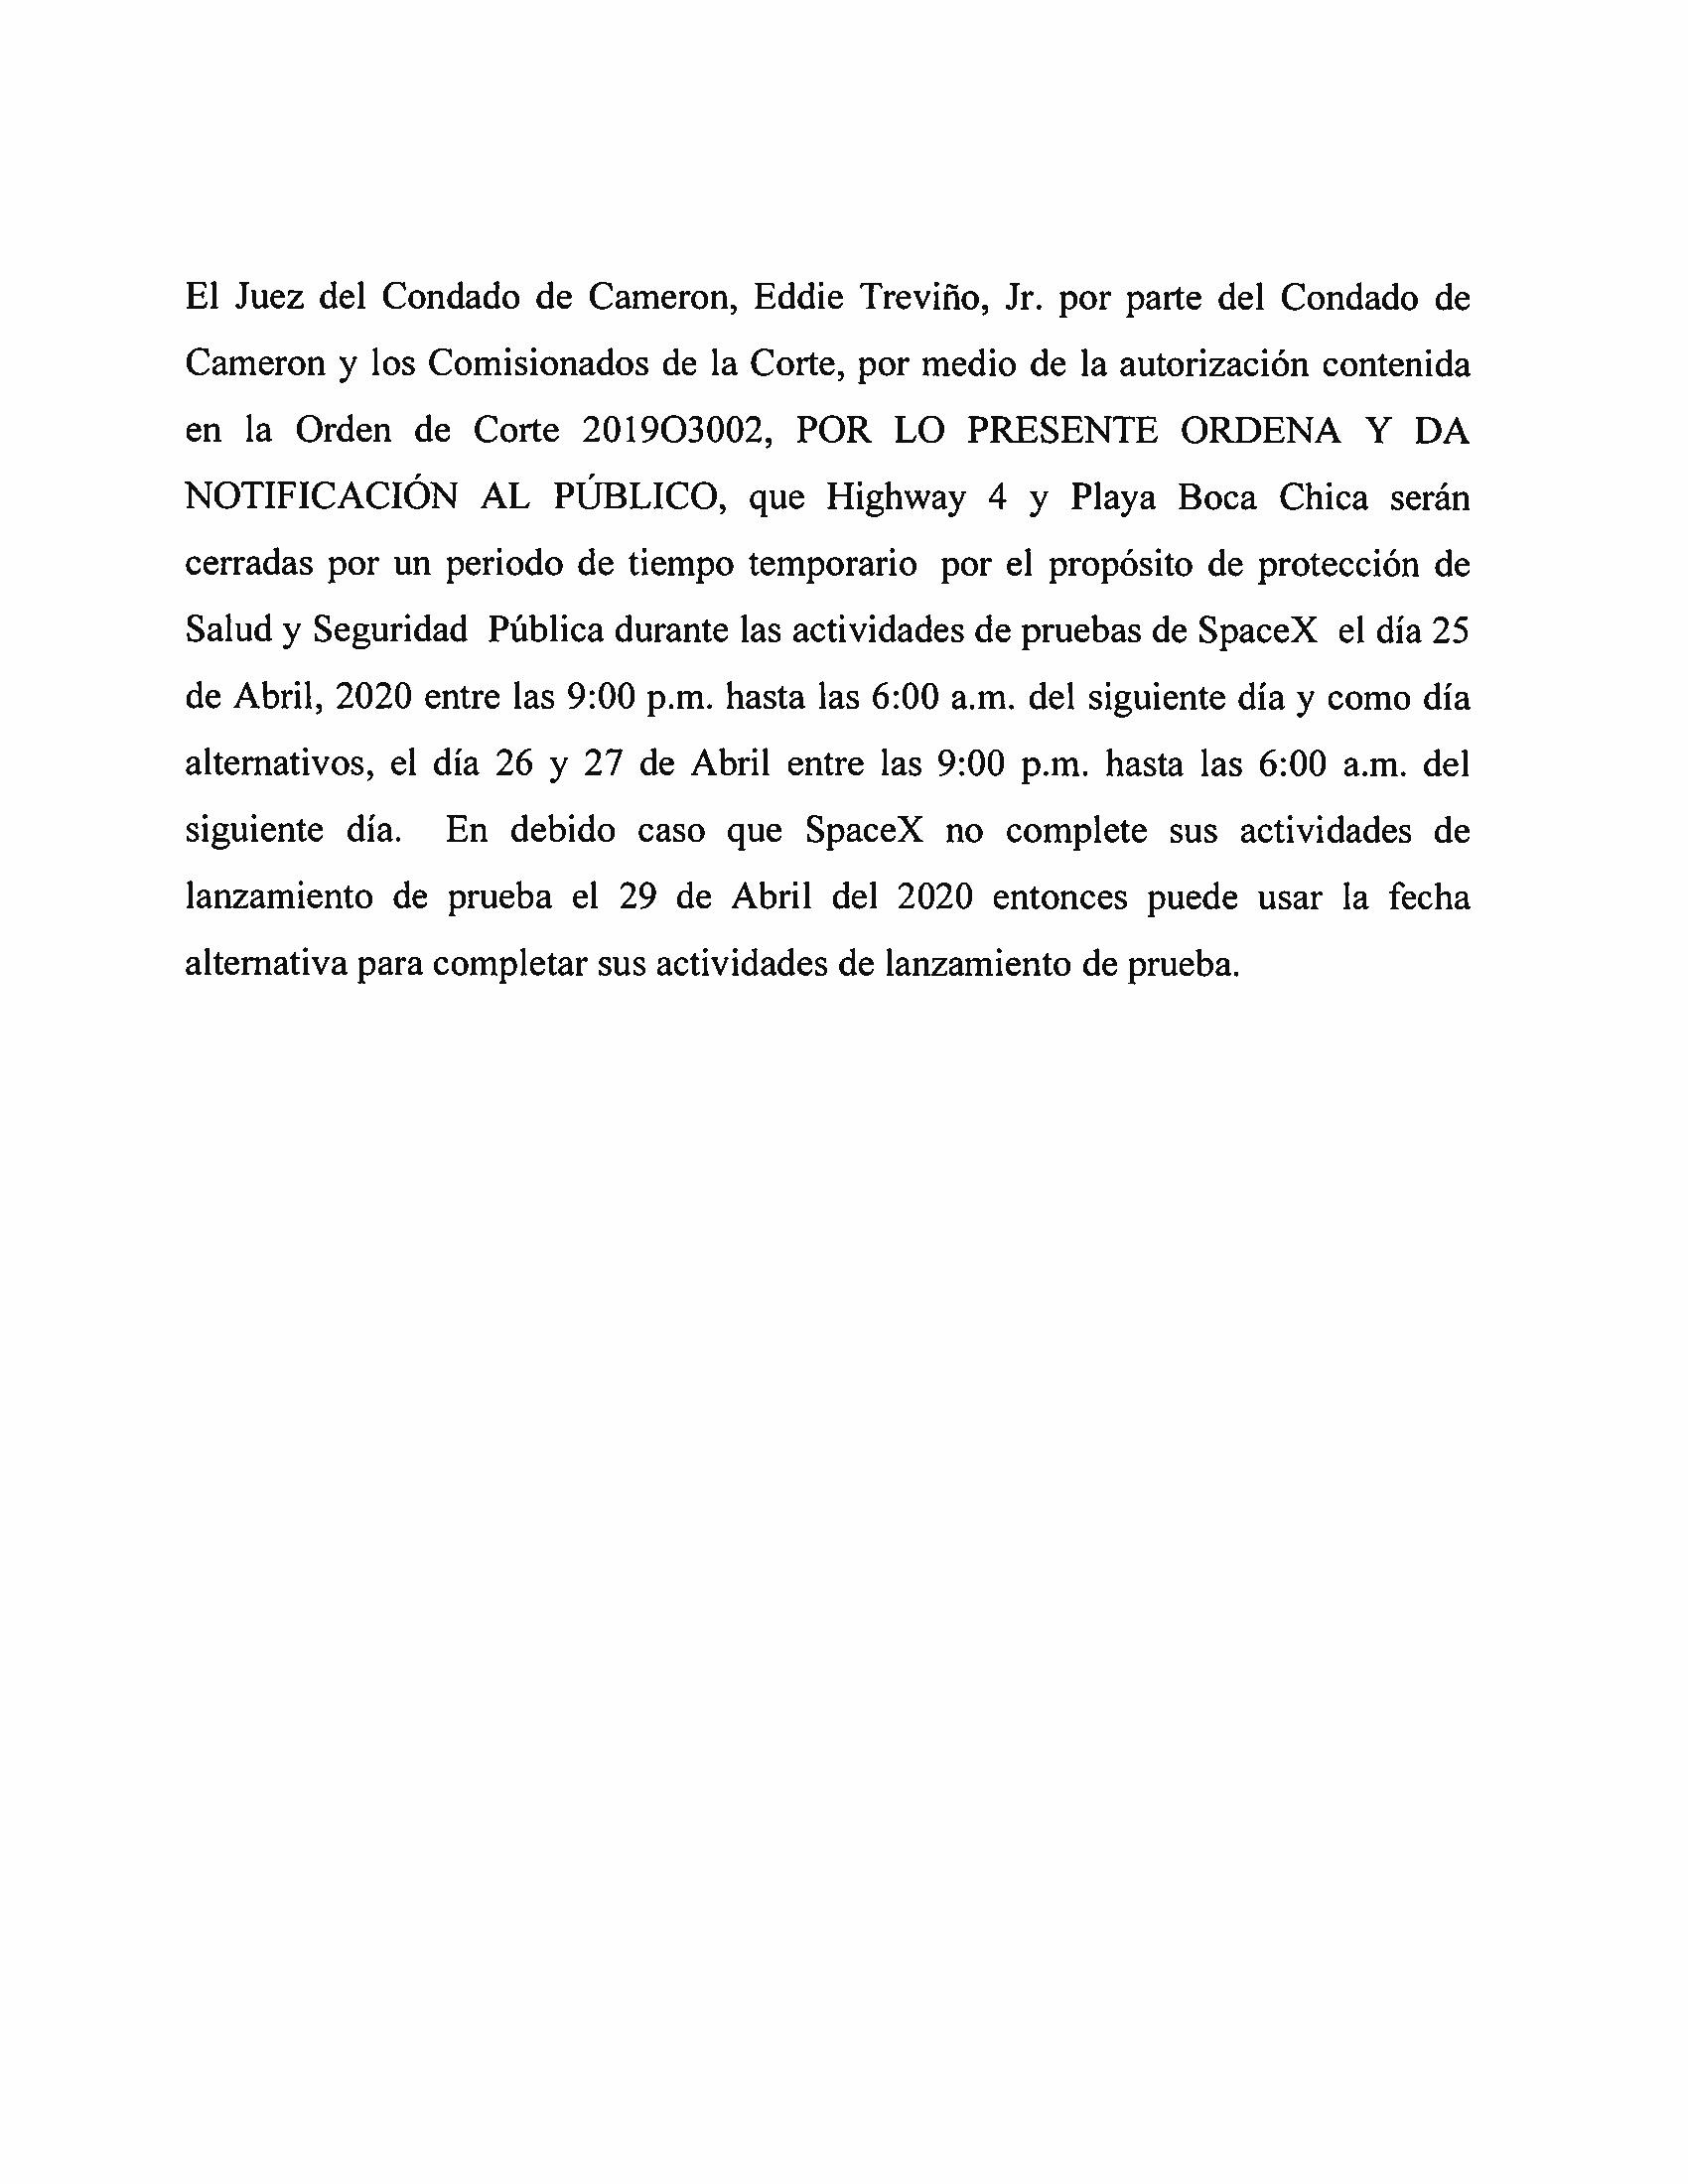 ORDER.CLOSURE OF HIGHWAY 4 Y LA PLAYA BOCA CHICA.SPANISH.04.25.20